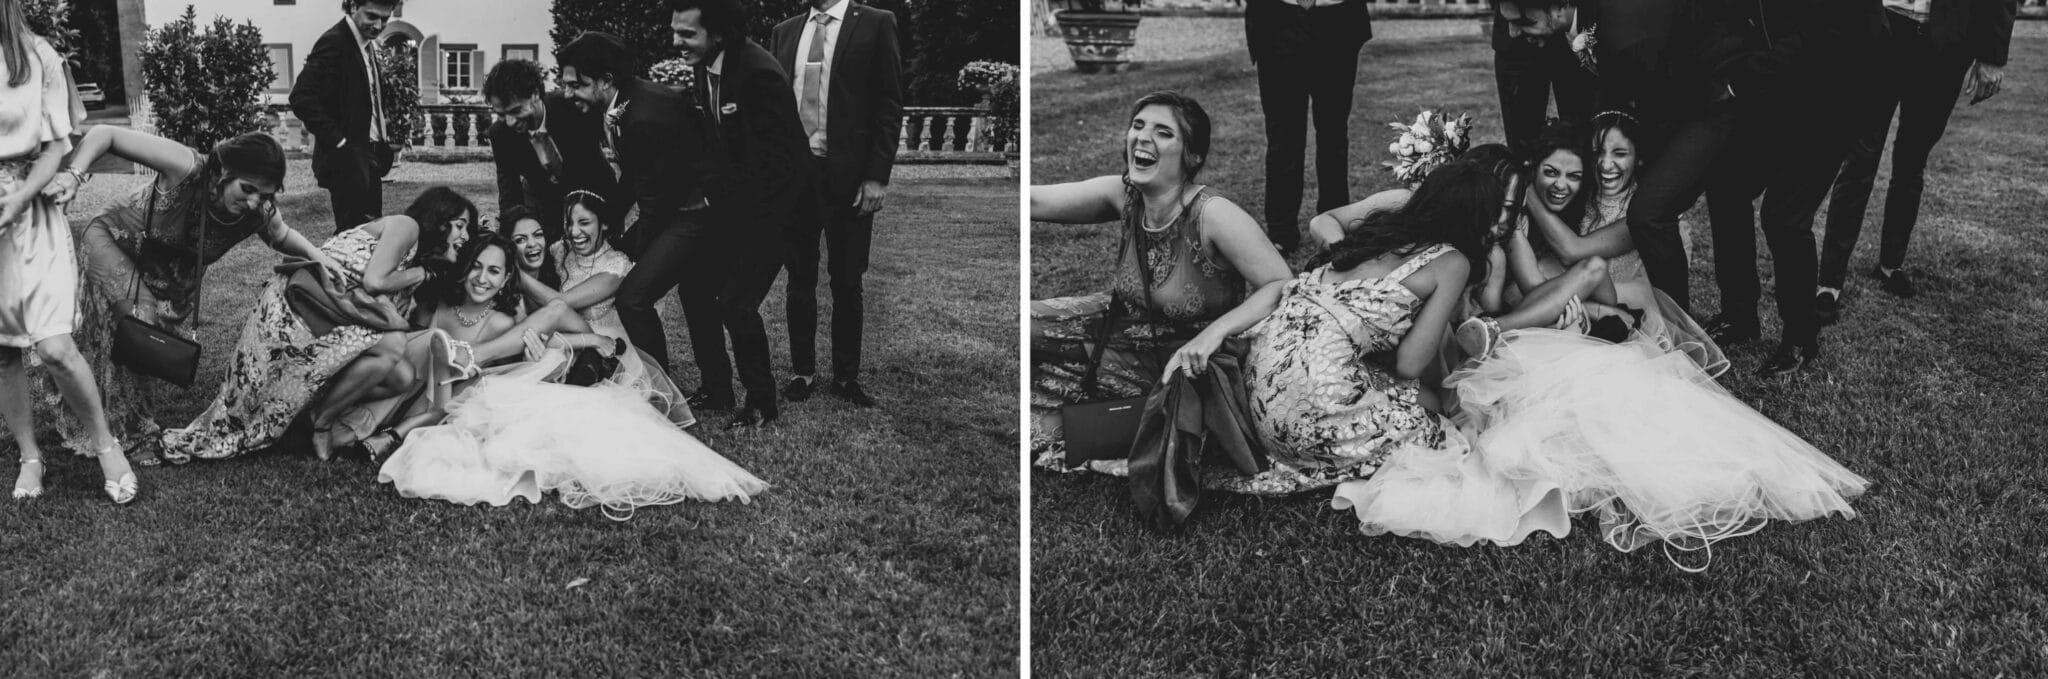 sequenza degli scherzi a Villa Grabau durante un matrimonio